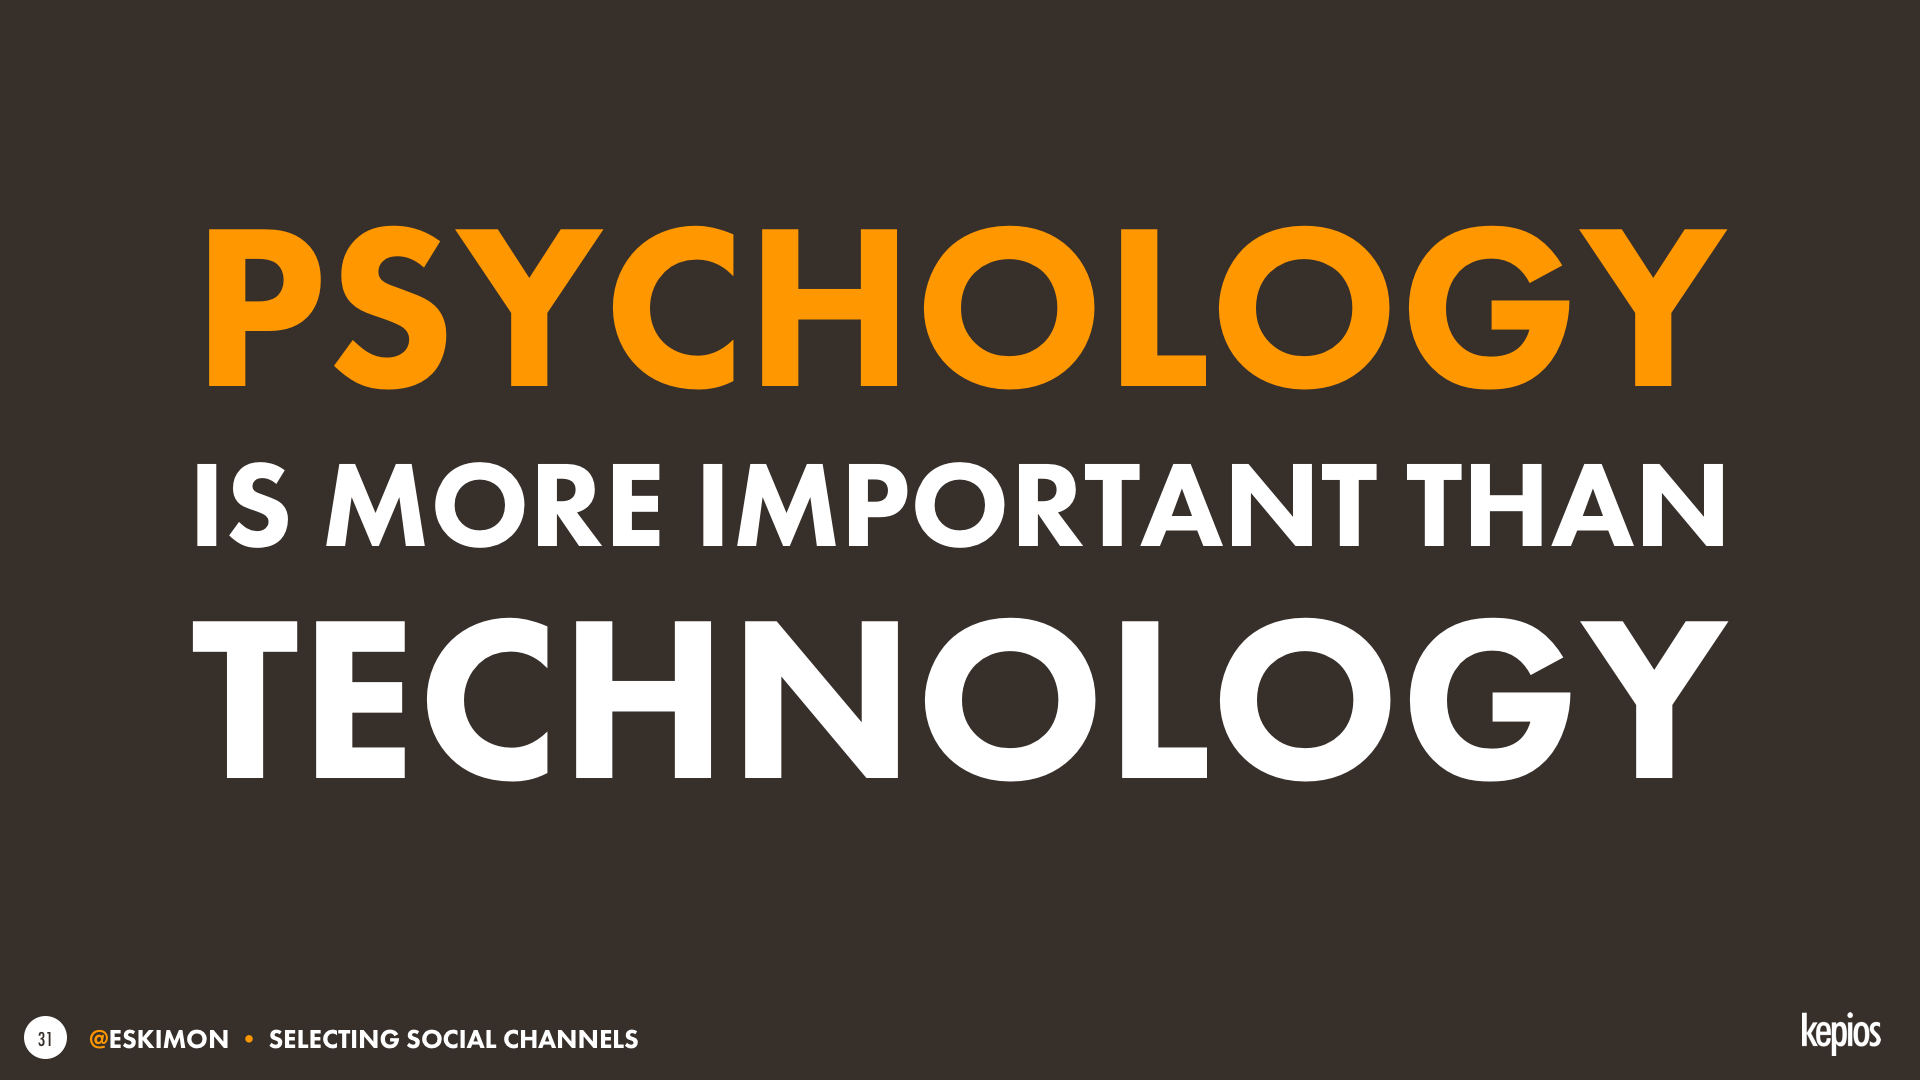 Psychology matters more than technology